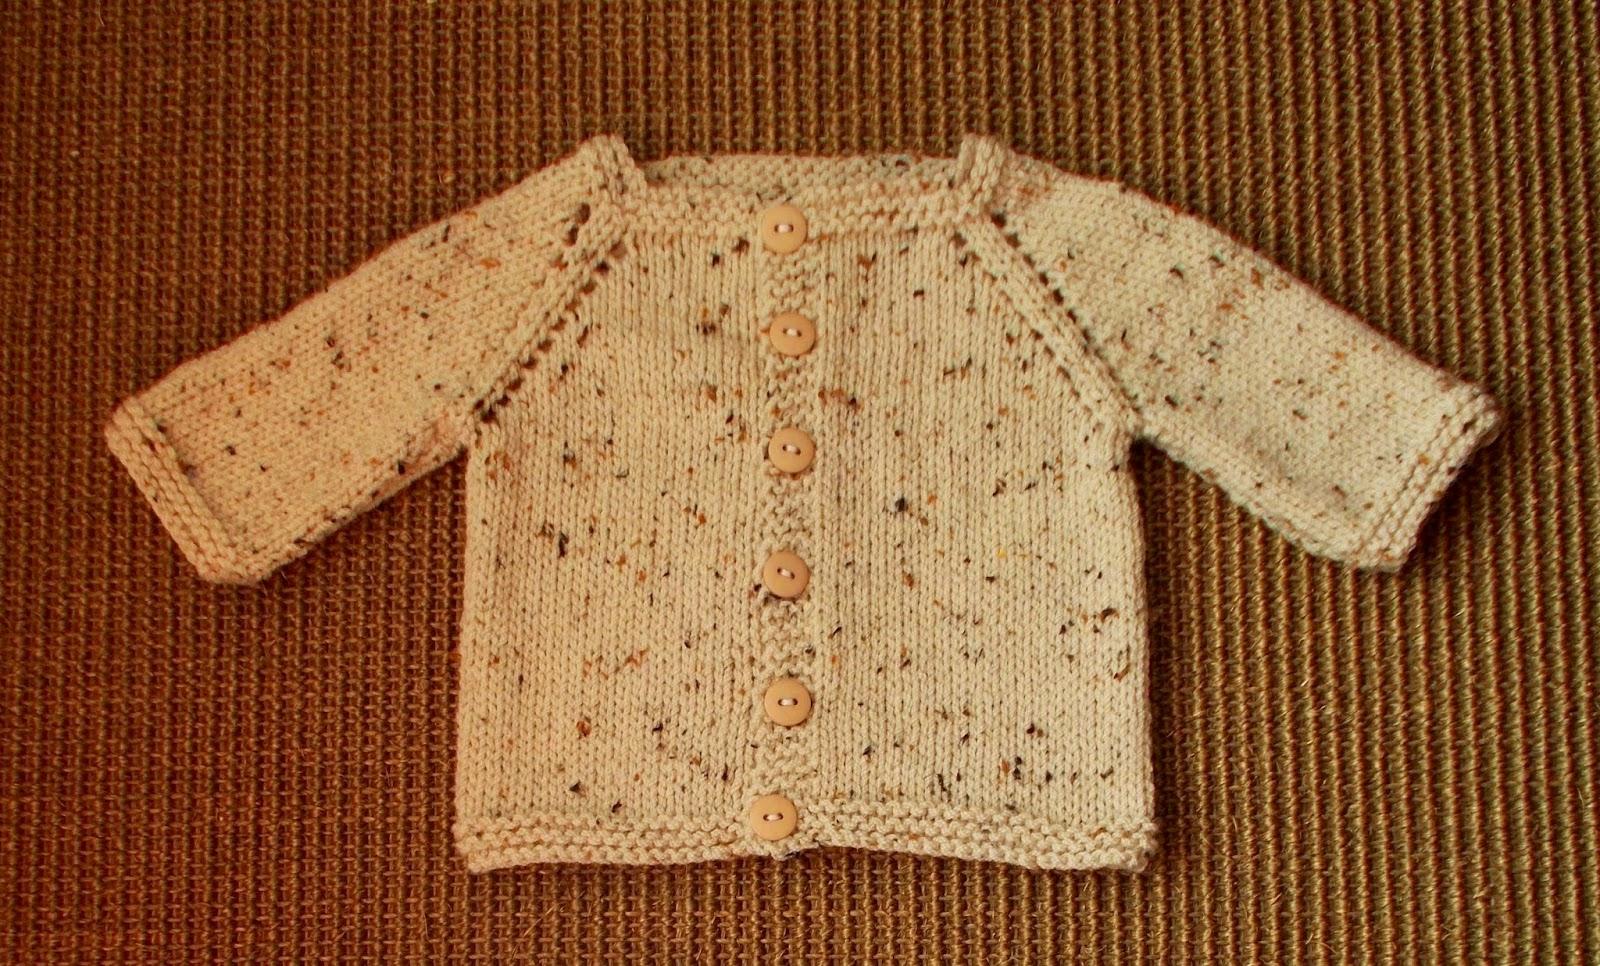 Knitting Yrn K2tog : Marianna s lazy daisy days max baby cardigan jacket